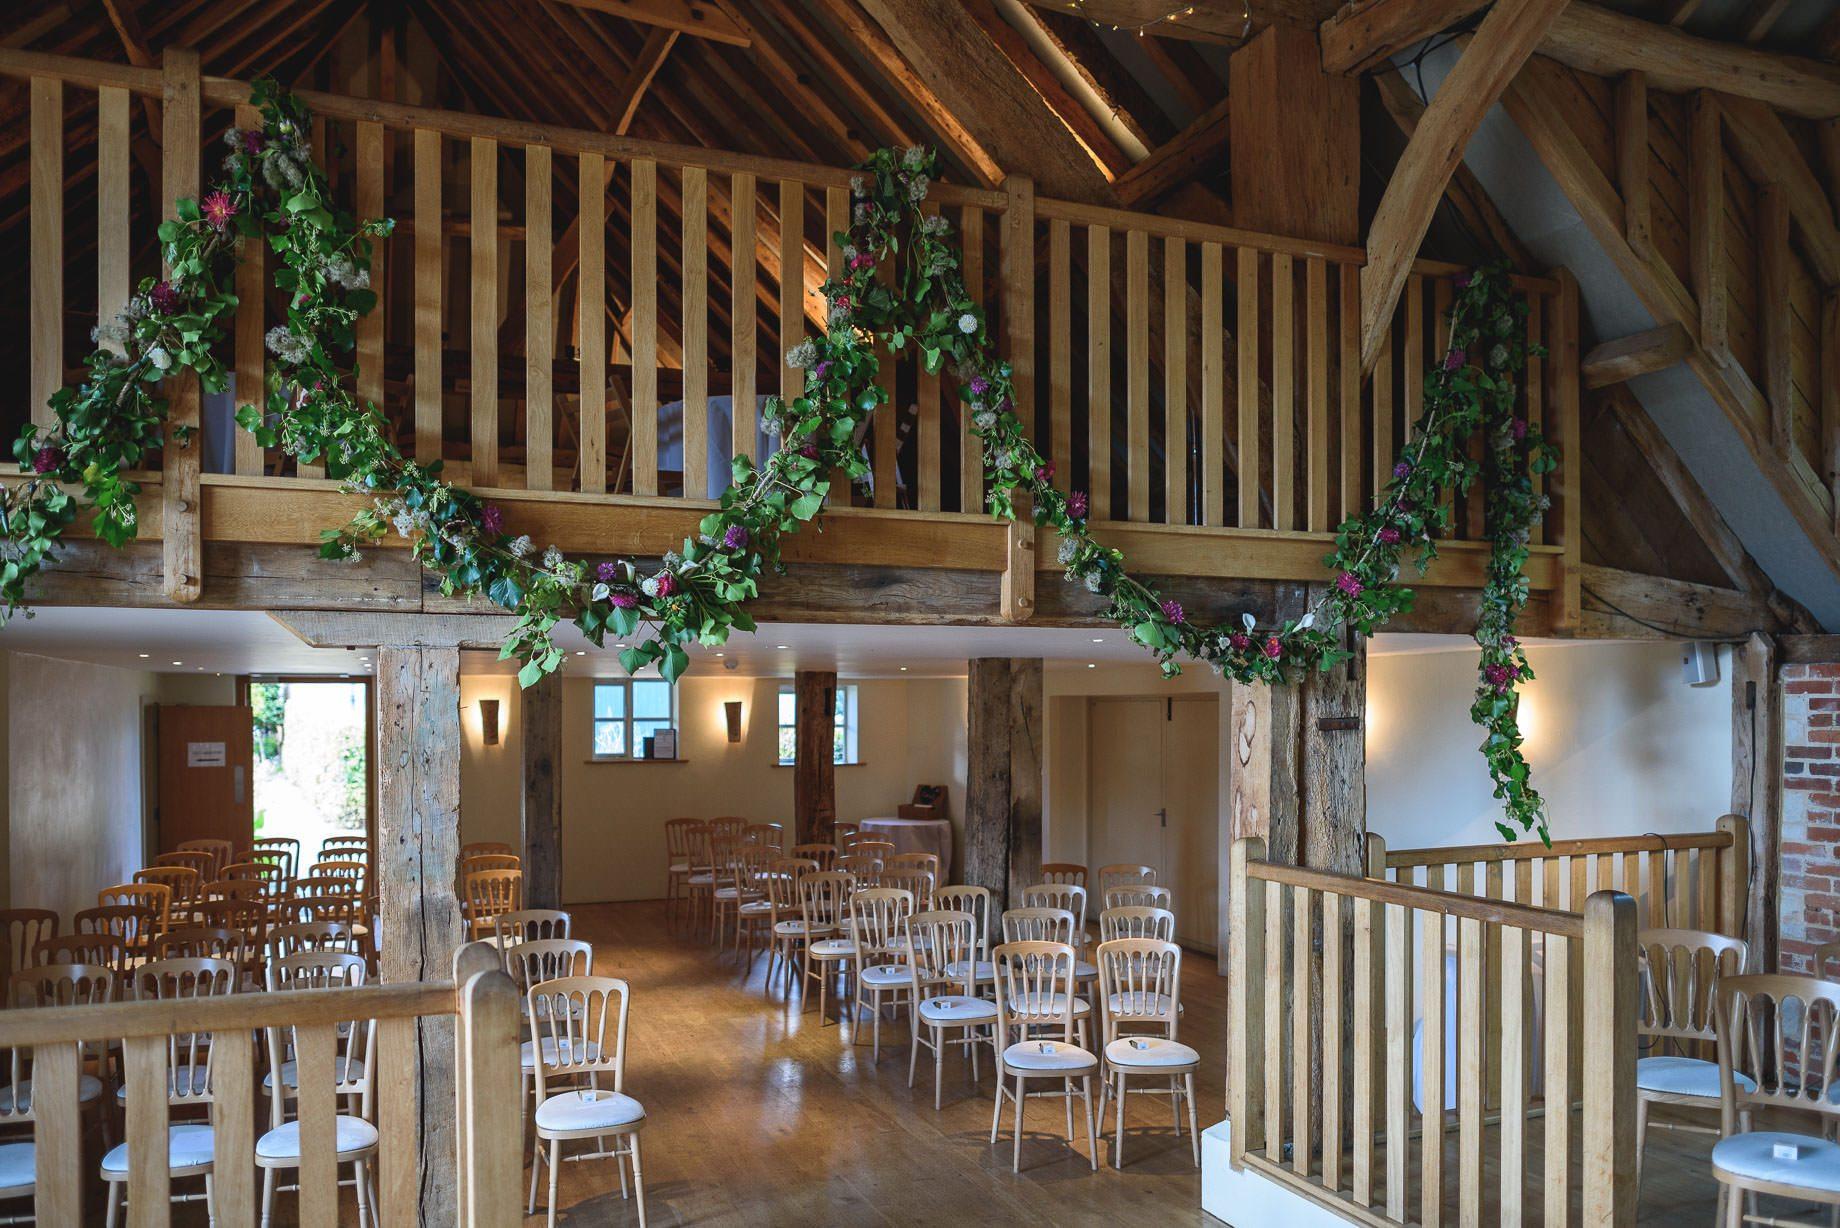 bury-court-barn-wedding-photography-guy-collier-photography-nadia-tom-4-of-184